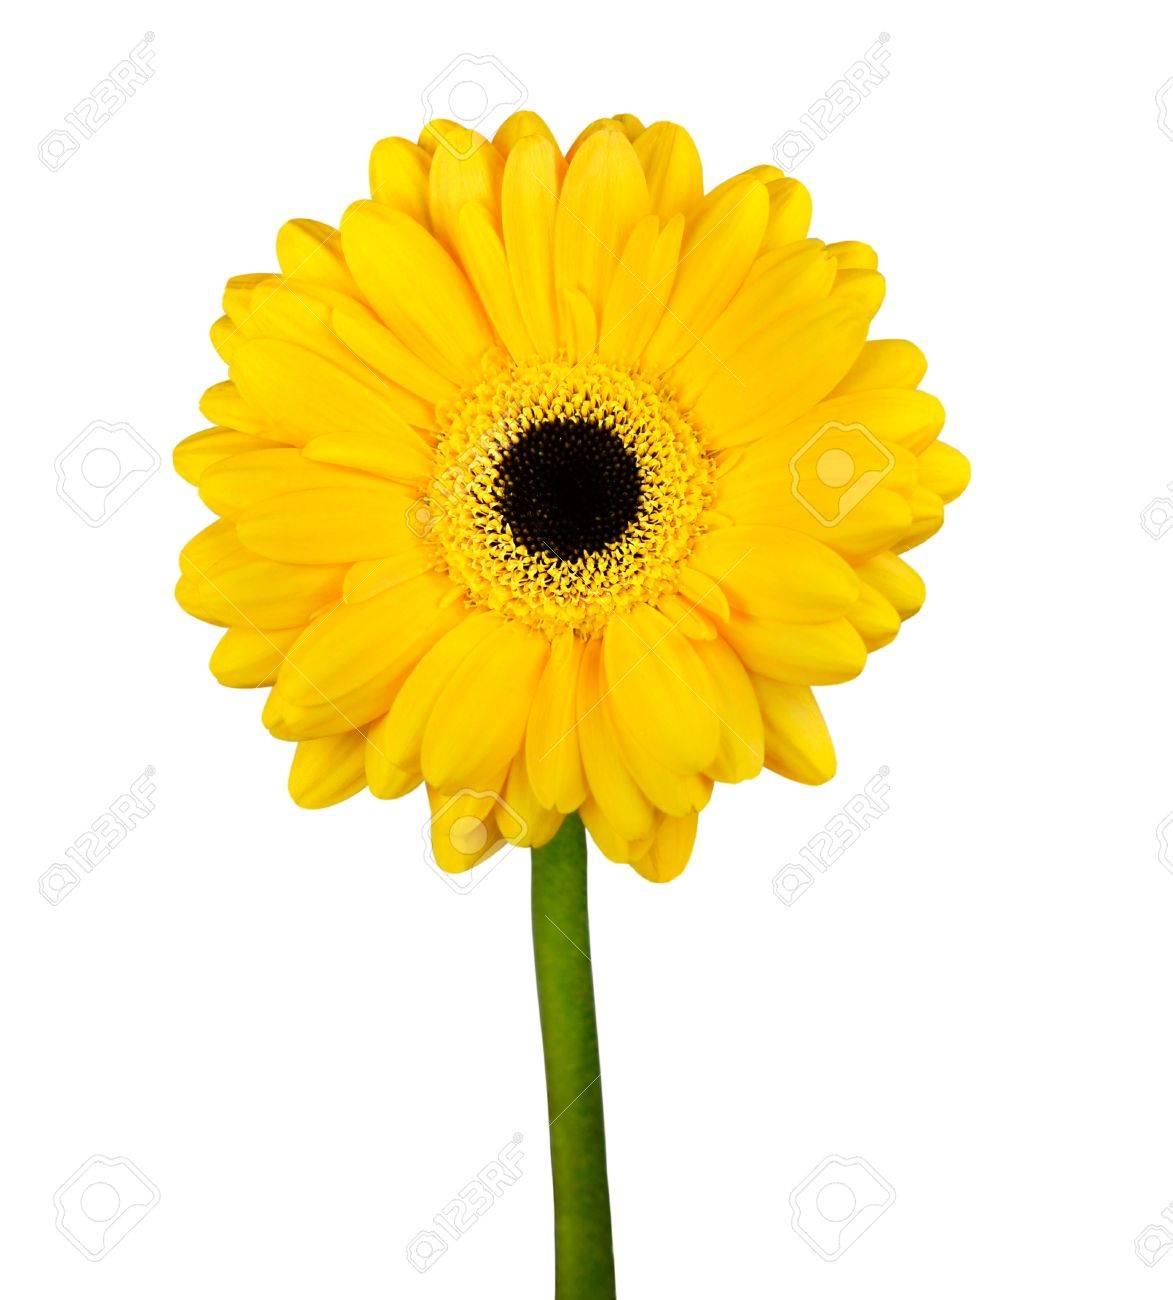 Yellow gerbera flower with green stem isolated on white background stock photo yellow gerbera flower with green stem isolated on white background mightylinksfo